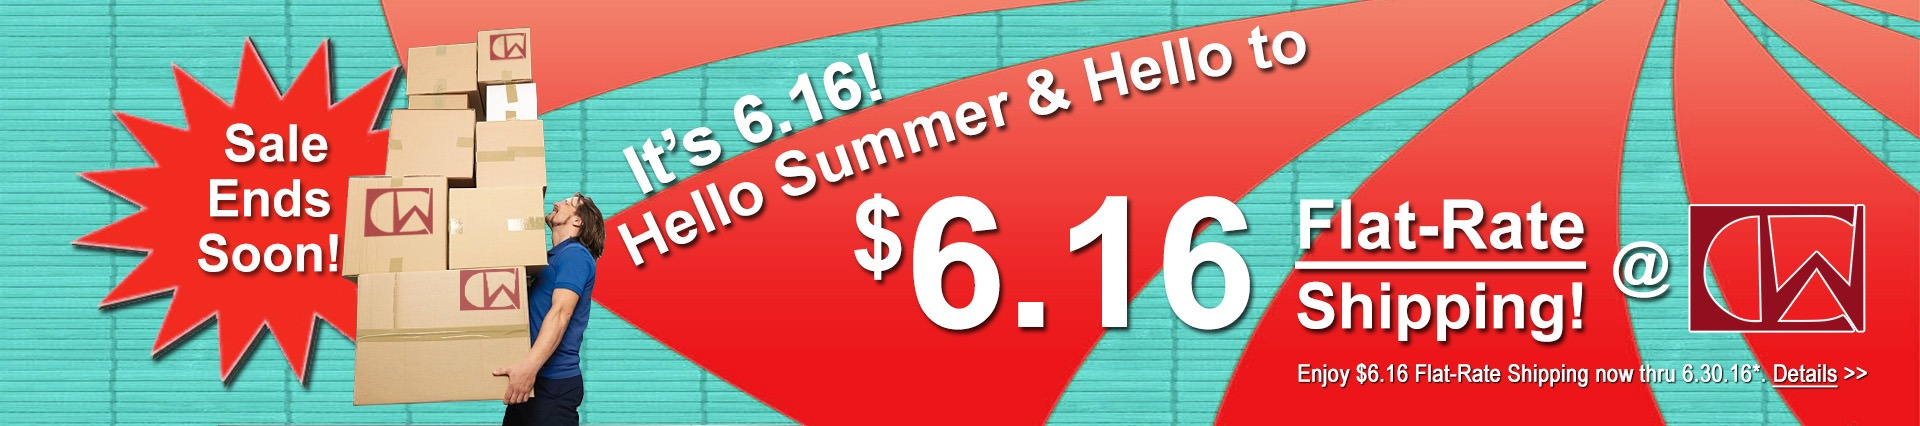 Enjoy $6.16 Flat Rate Shipping